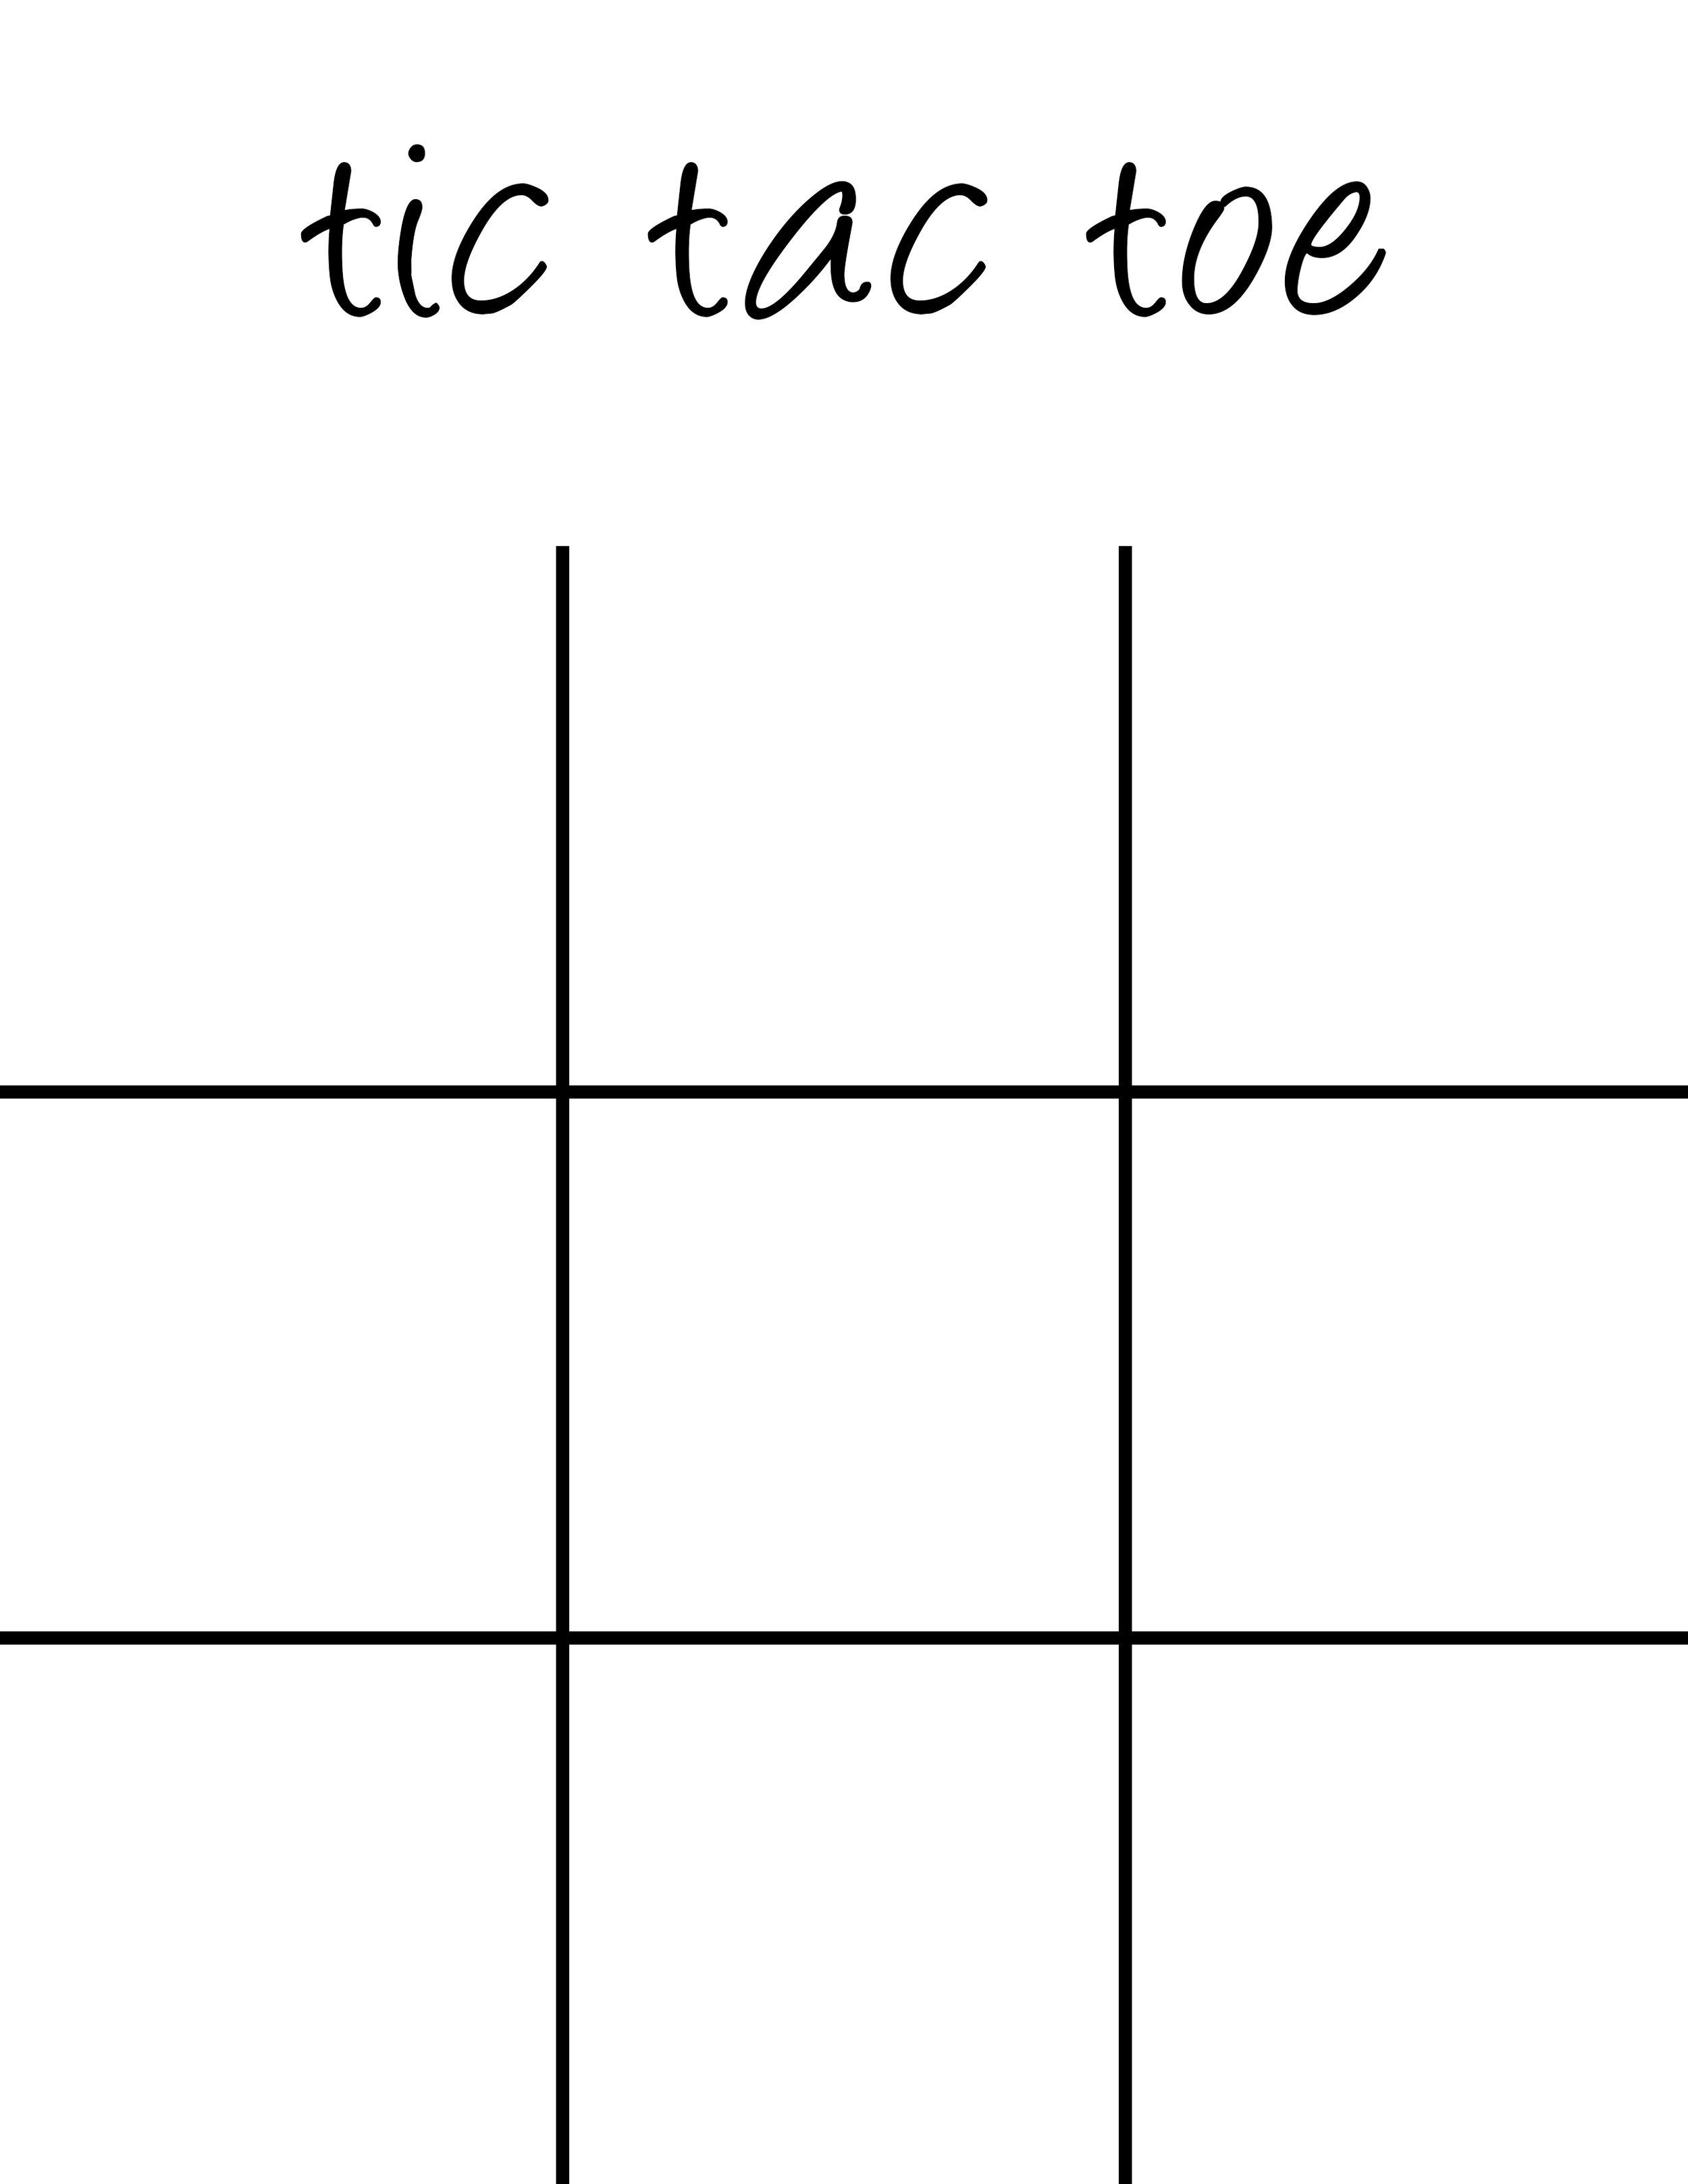 Tic-Tac-Toe-Board-letter.jpg